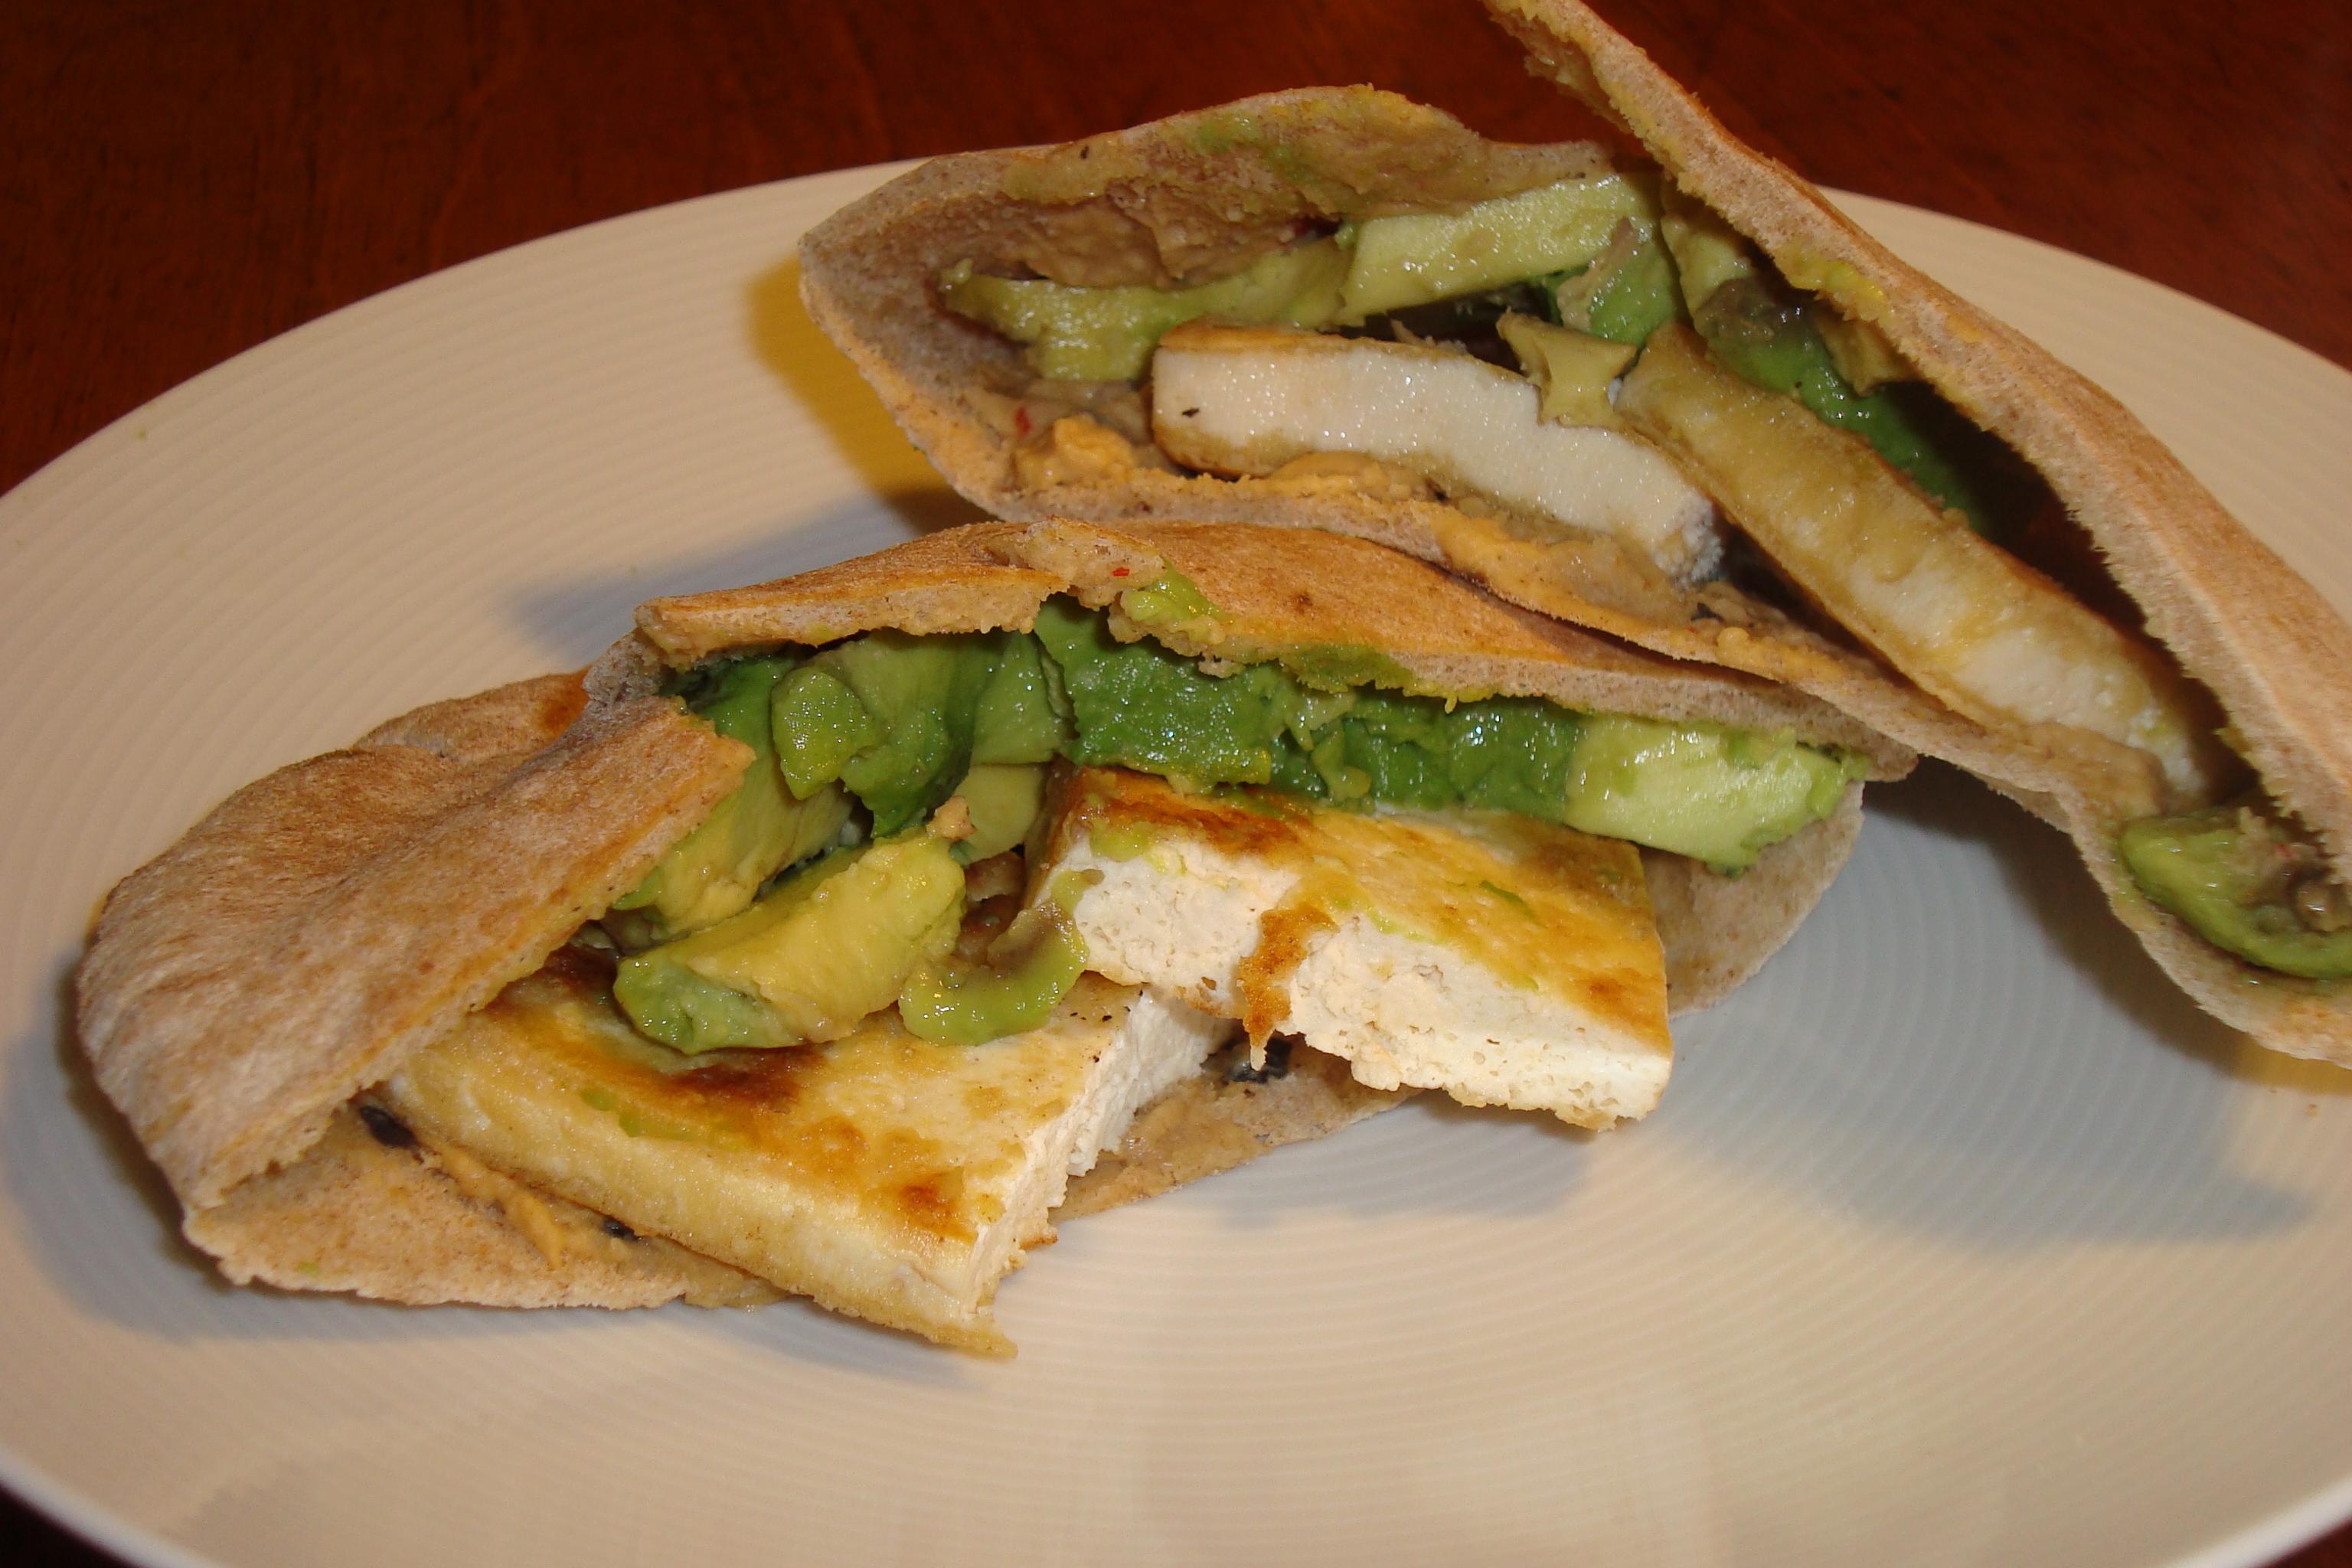 Tofu, avocado, and hummus sandwiches | Tiny Perfect Bites